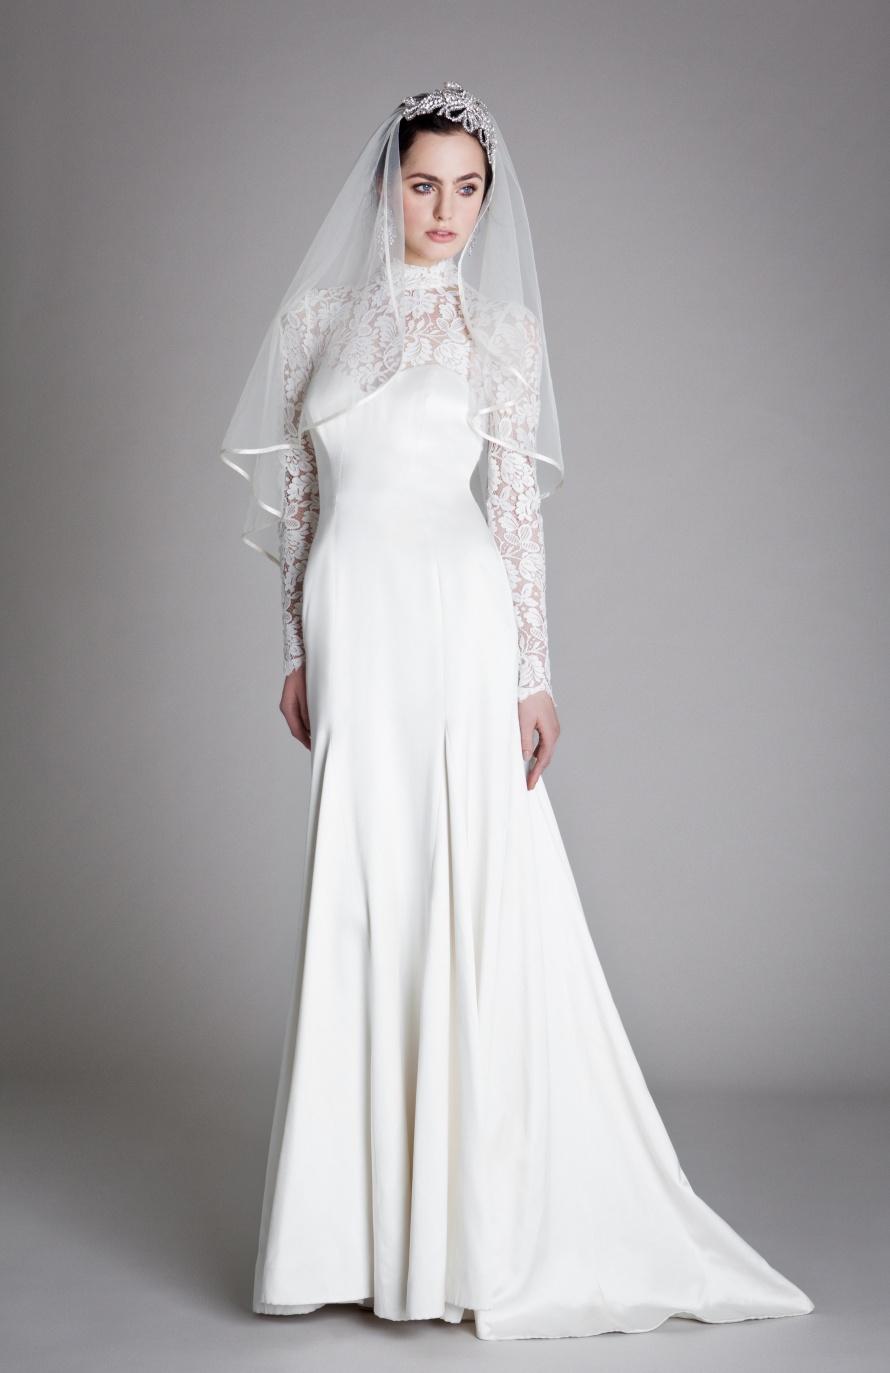 Victorian Inspired Vintage Wedding Dress